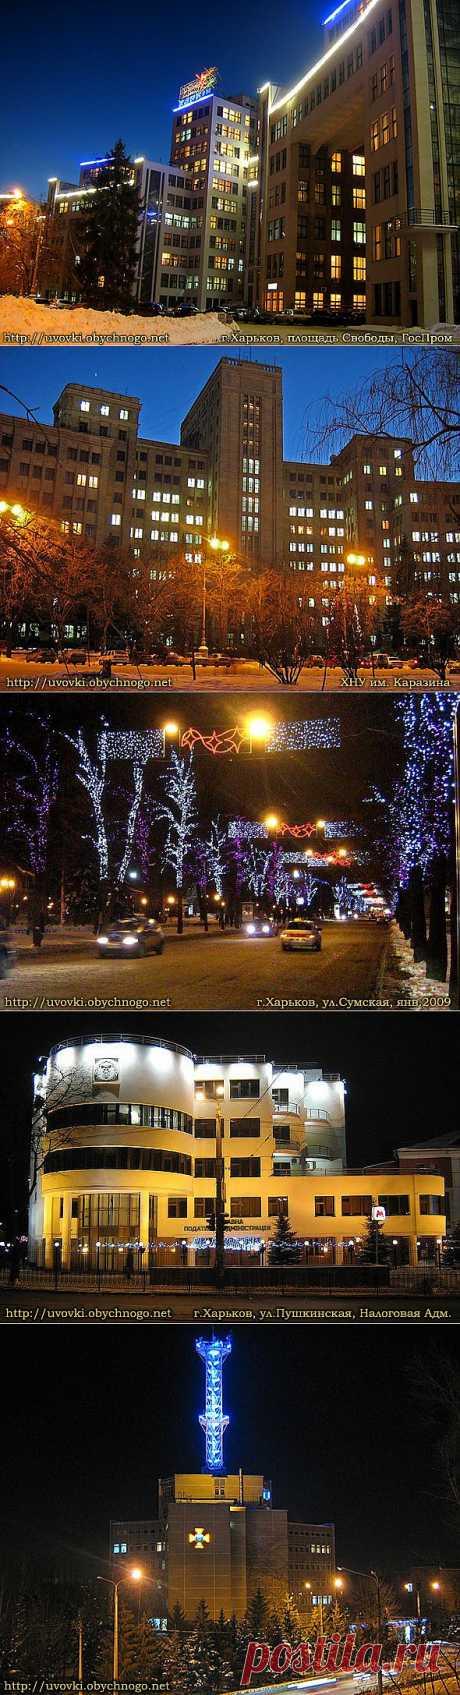 Ночной Харьков (2) Фото | Блог Астронома-романтика